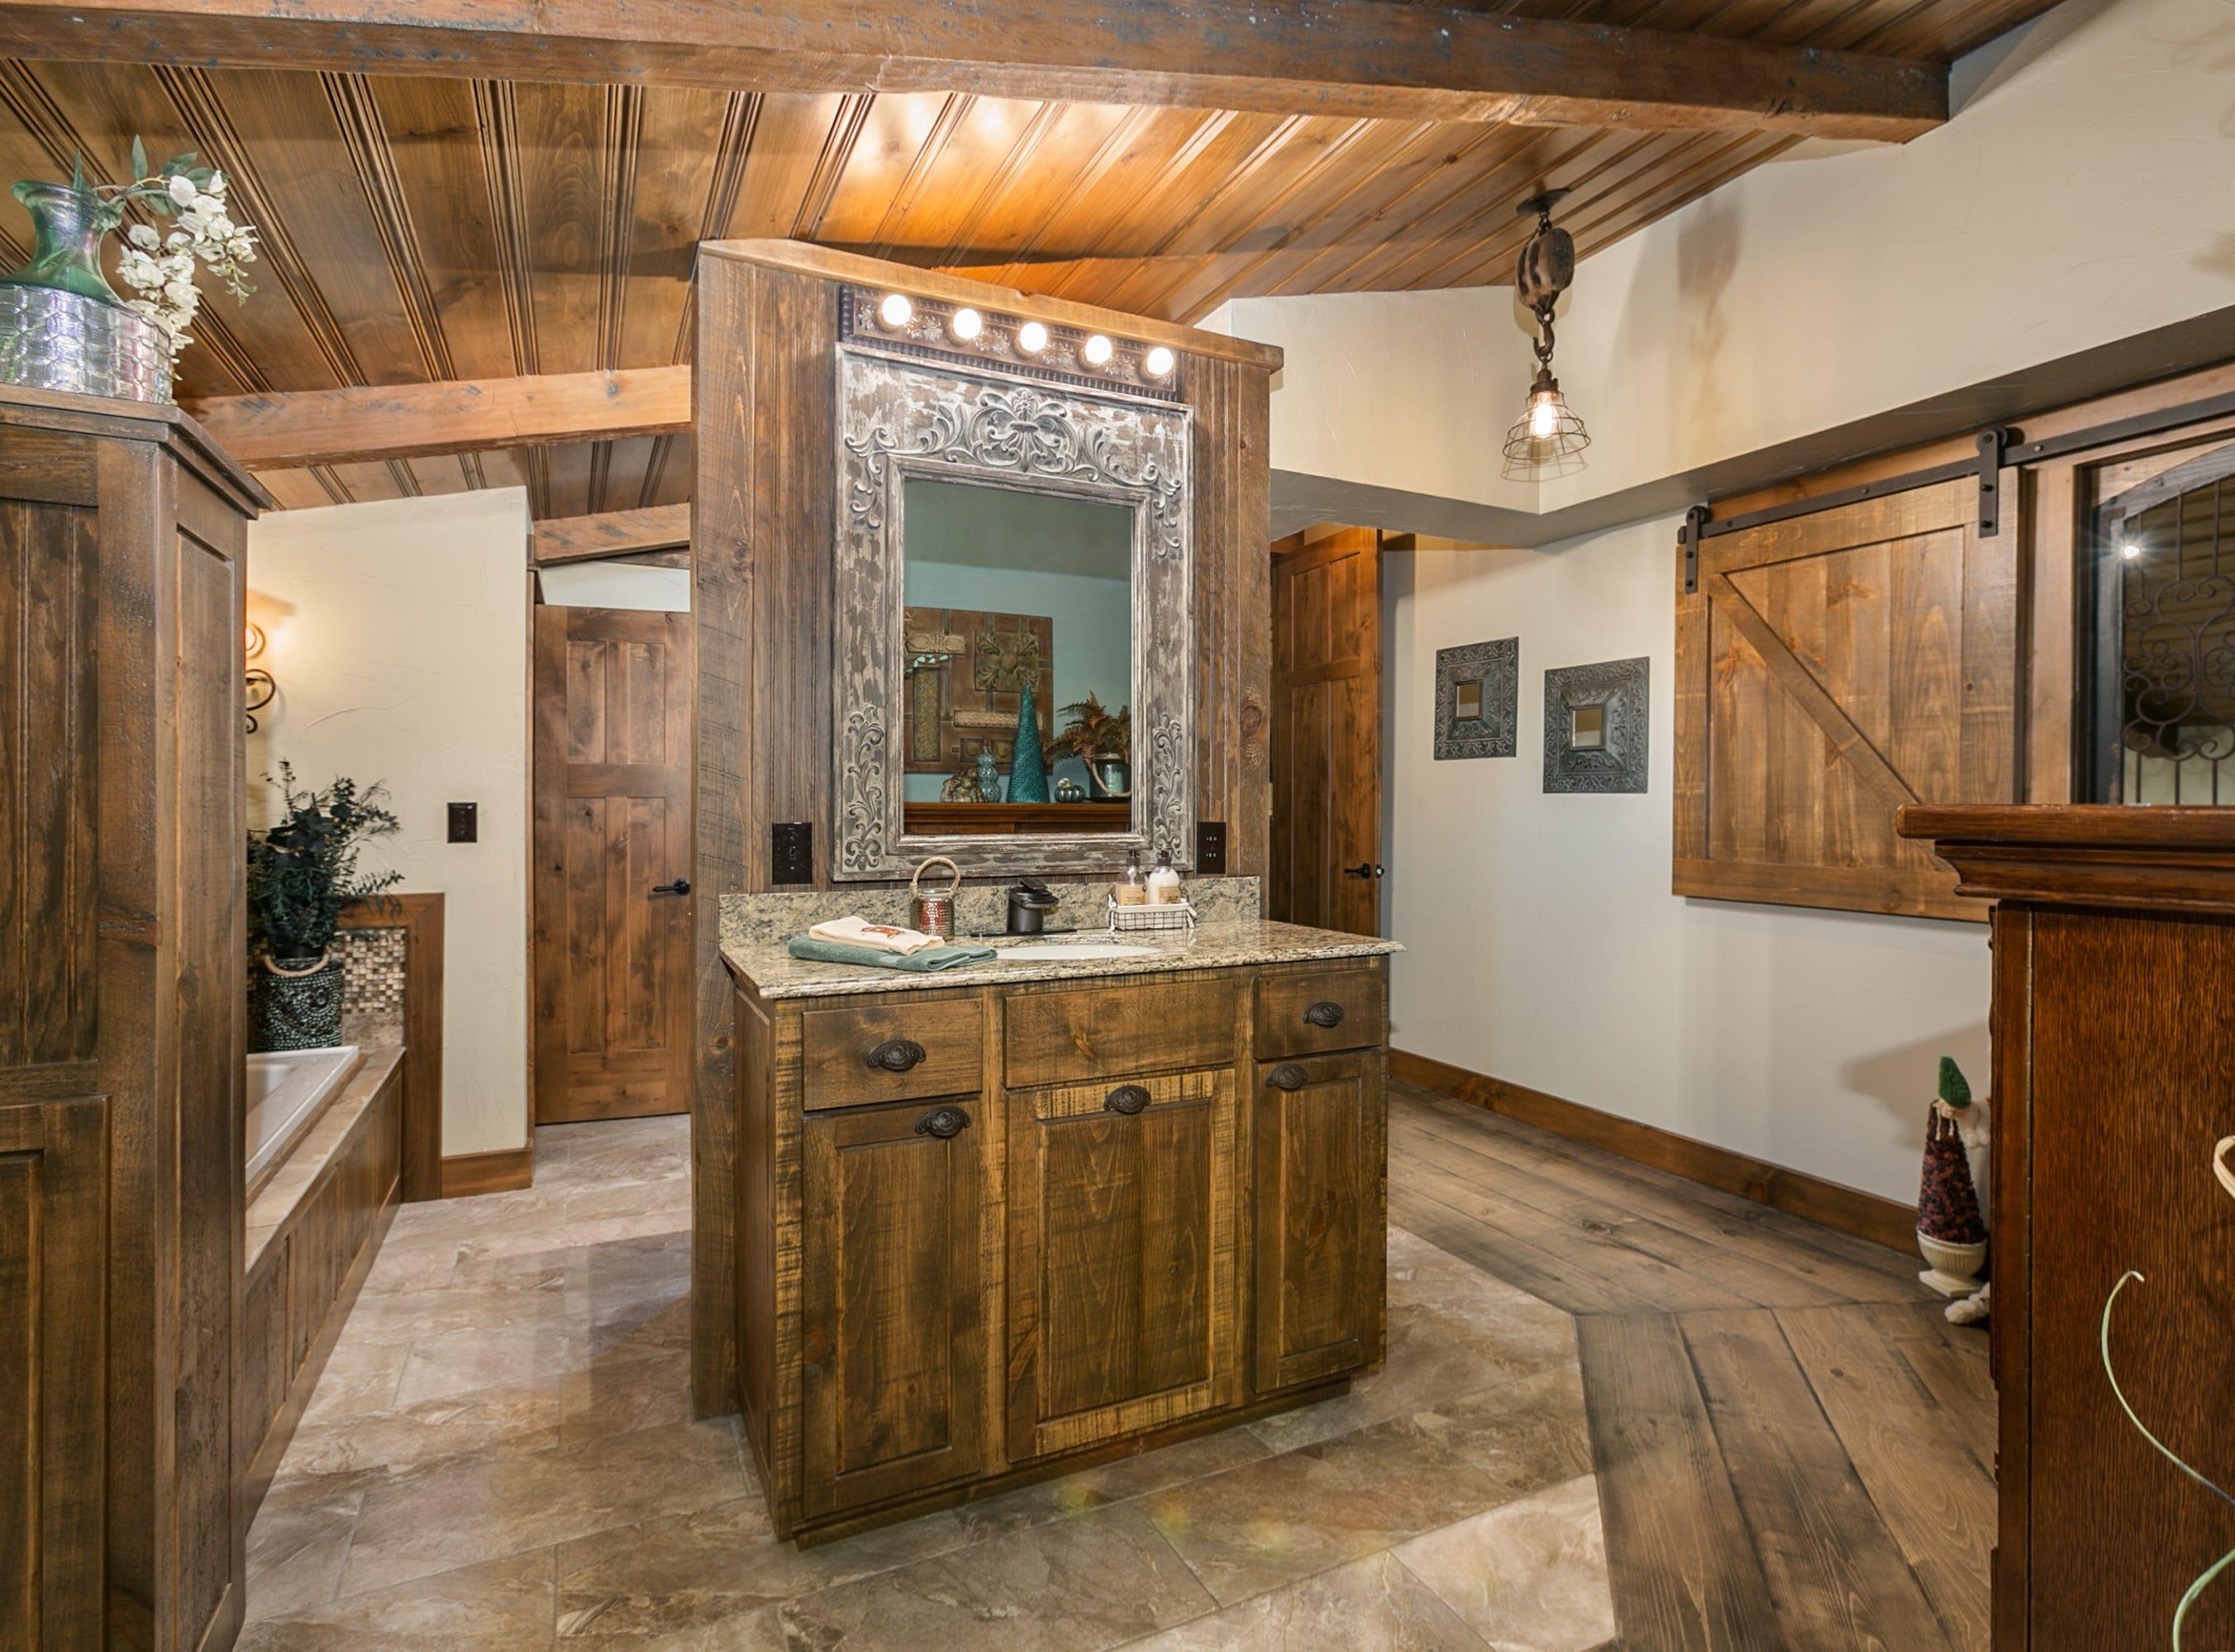 A spare bedroom was transformed into a spacious master bath suite.